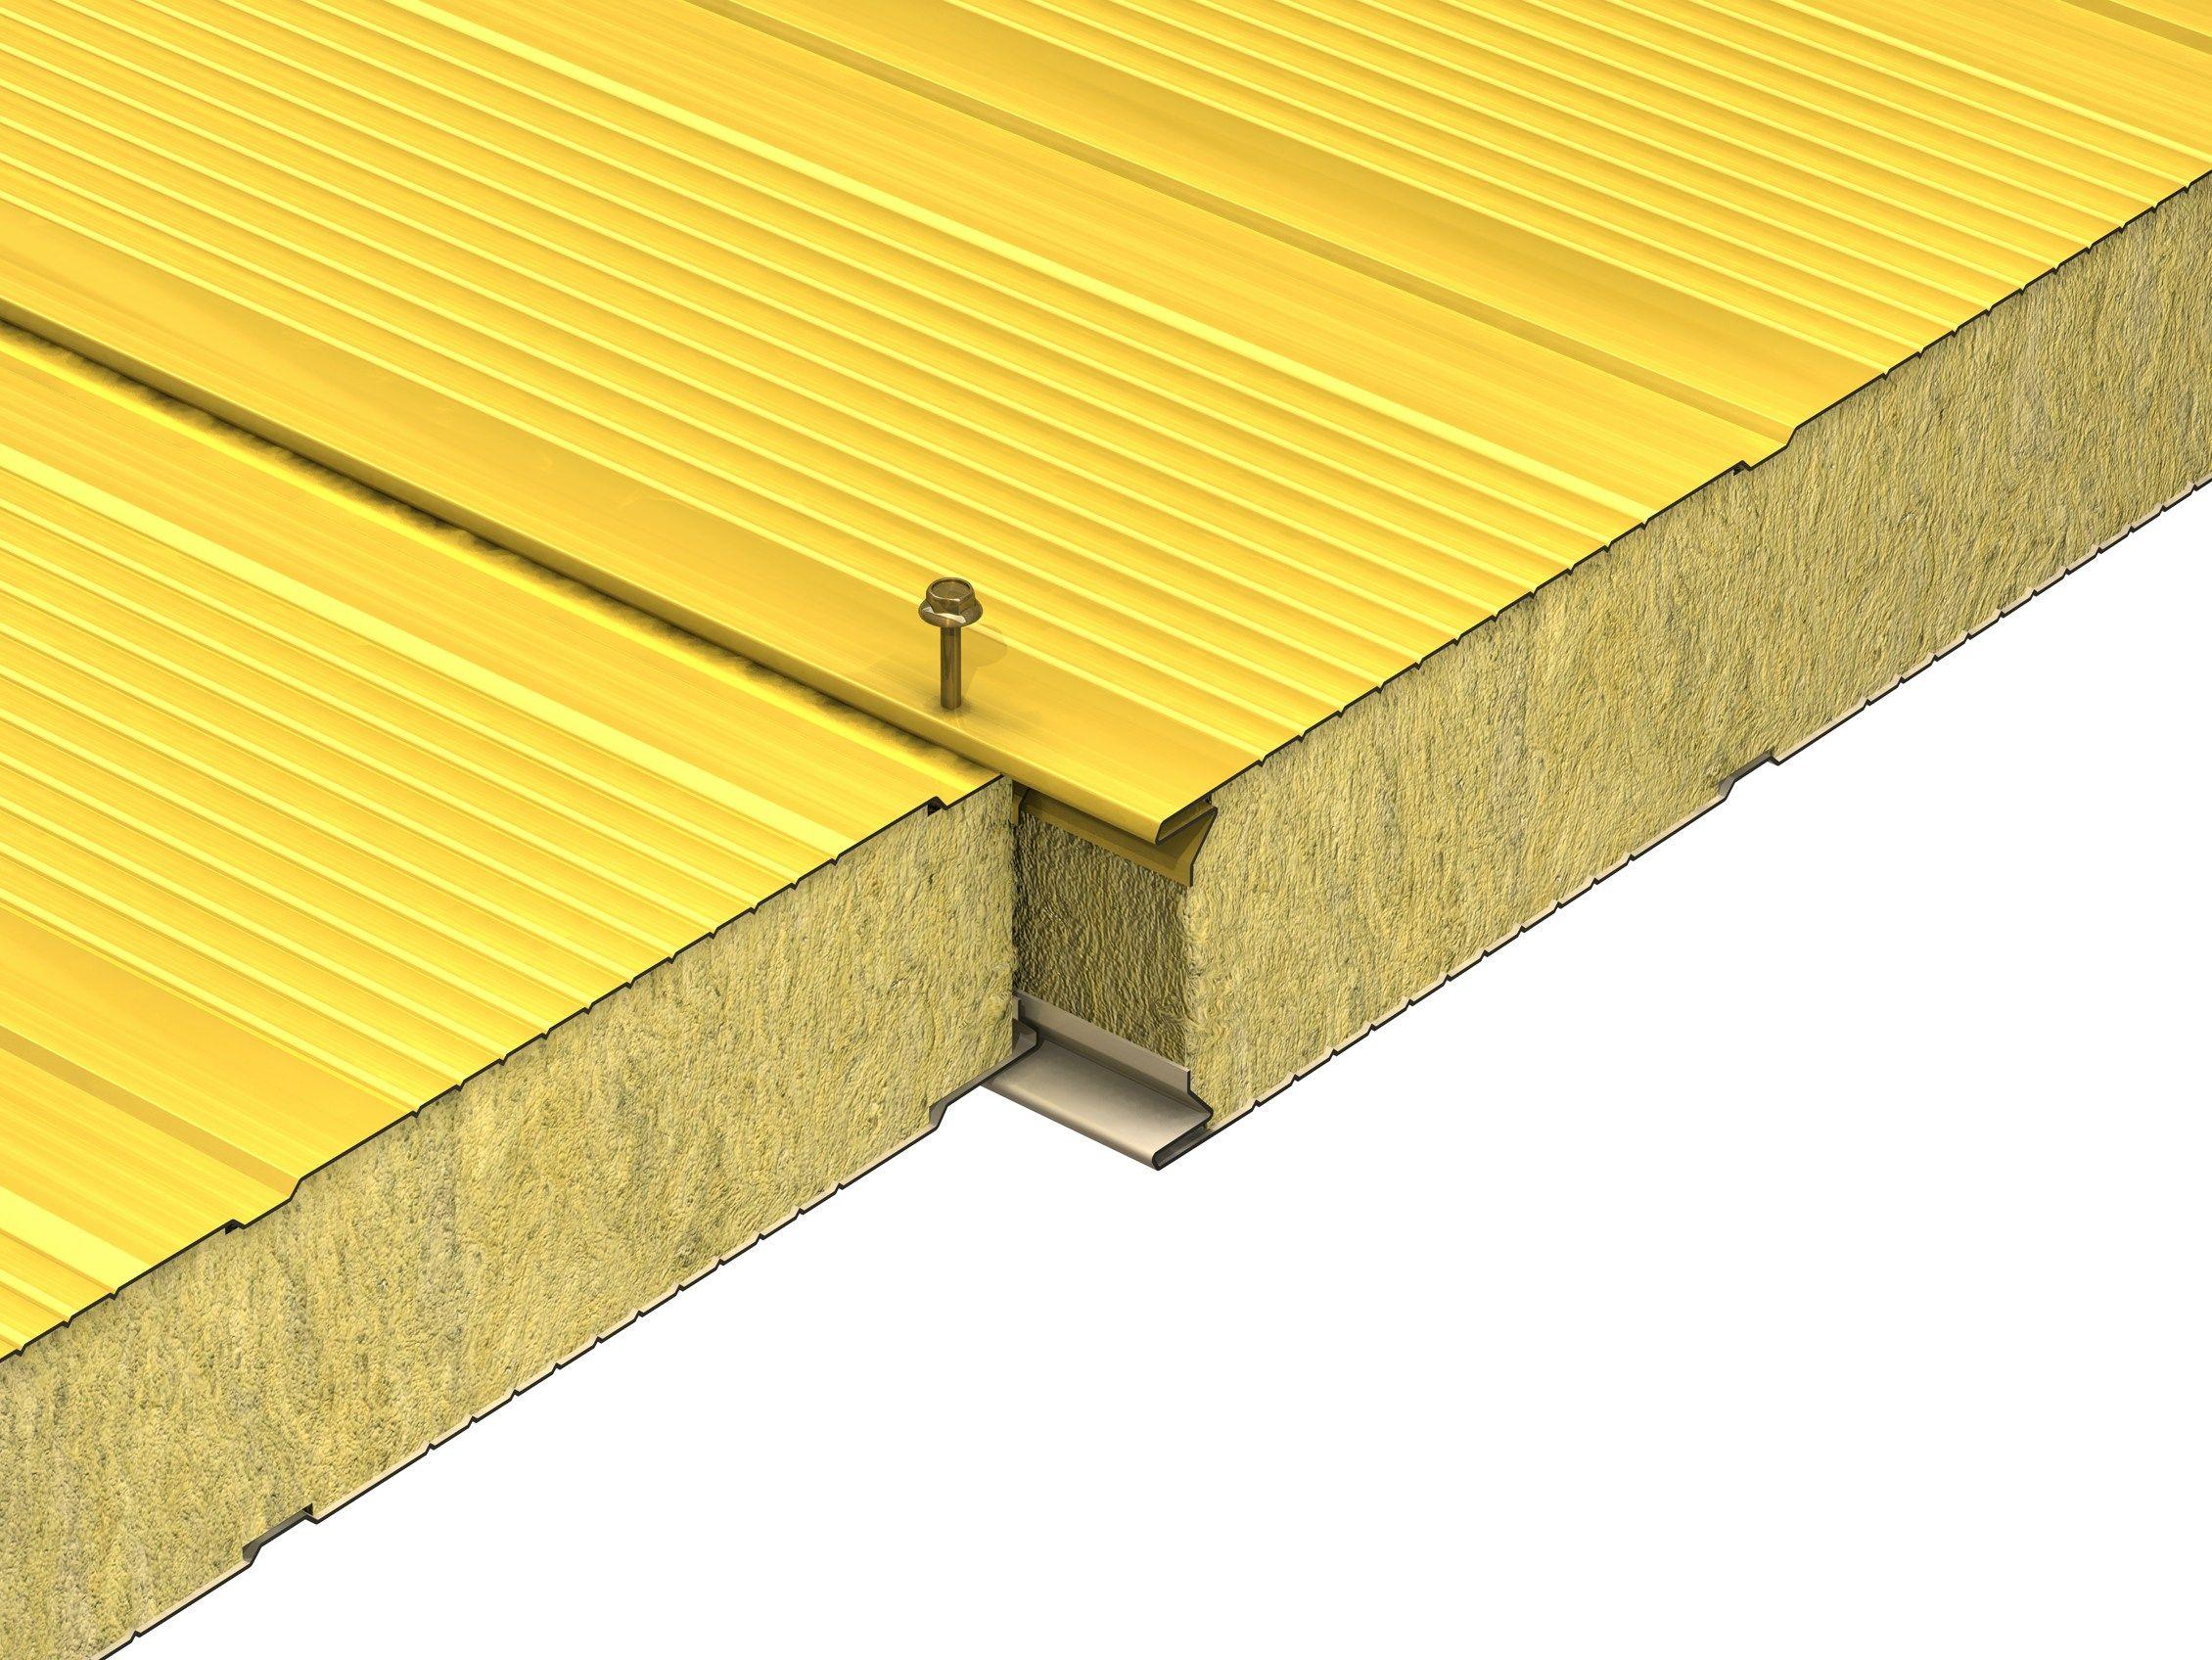 Pannello tagliafuoco per rivestimento esterno ATHOS by ELCOM SYSTEM